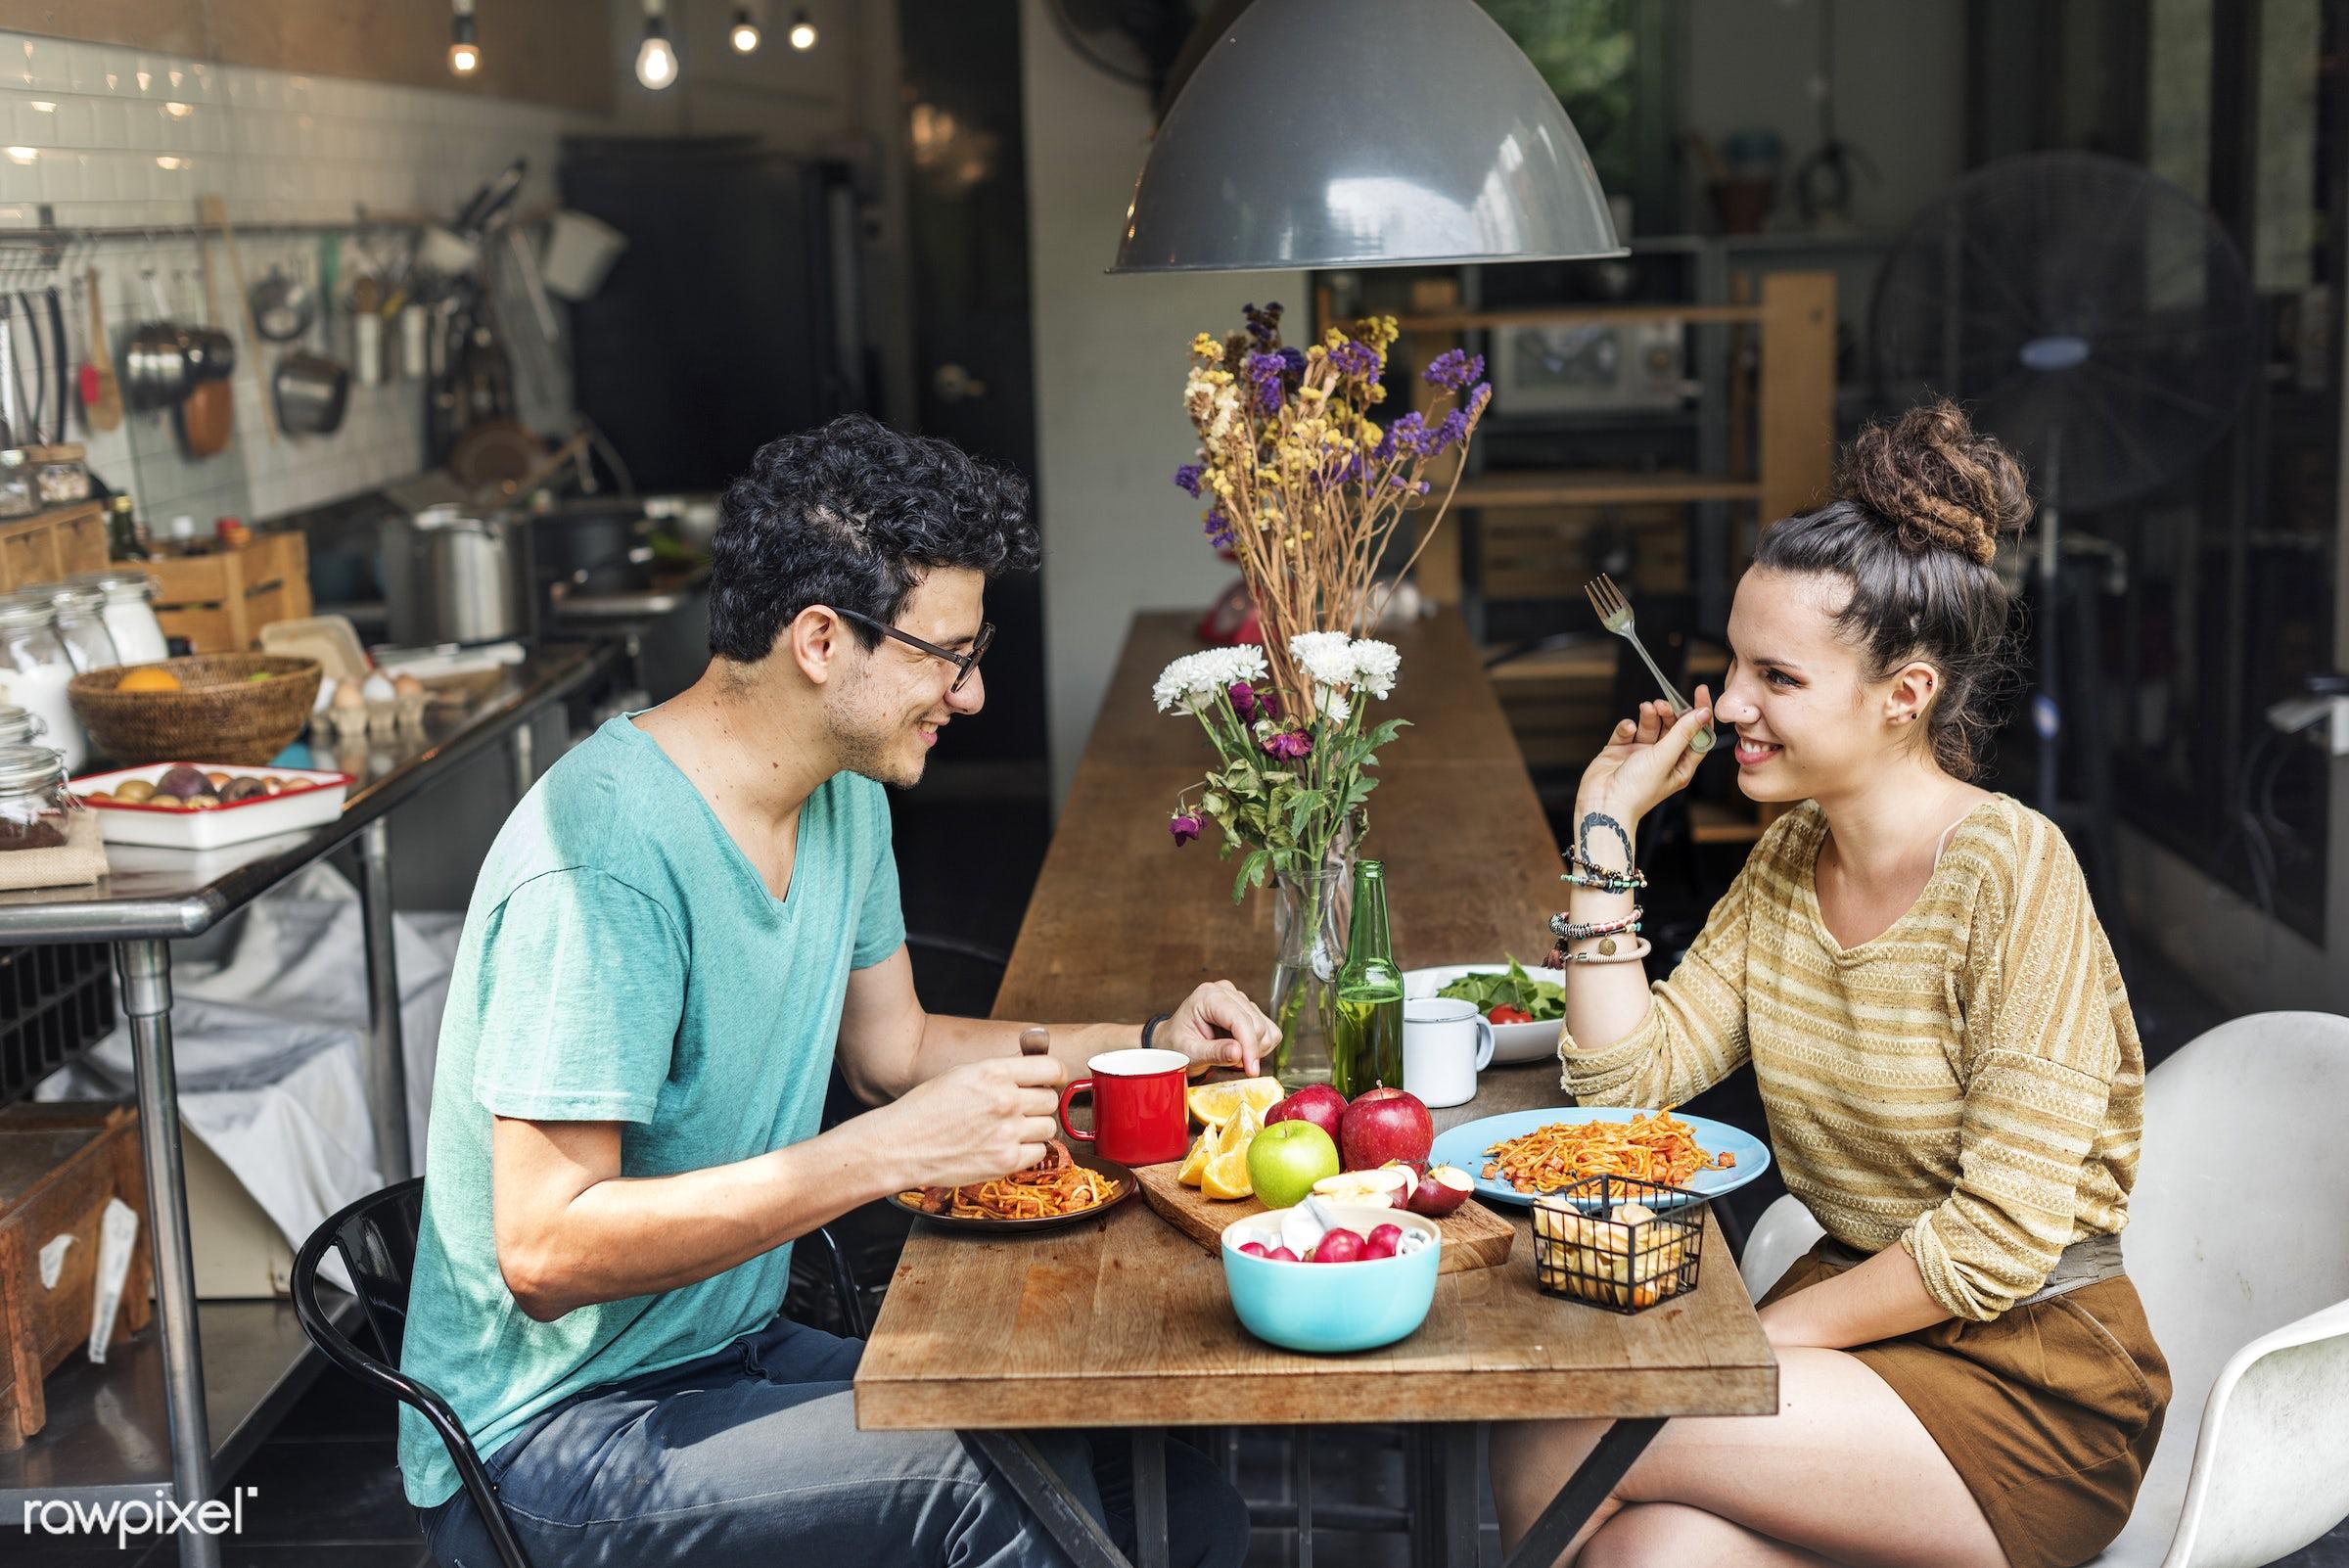 couple, breakfast, apple, activity, bonding, boyfriend, casual, cheerful, cuisine, culinary, dietary, dinner, eating,...